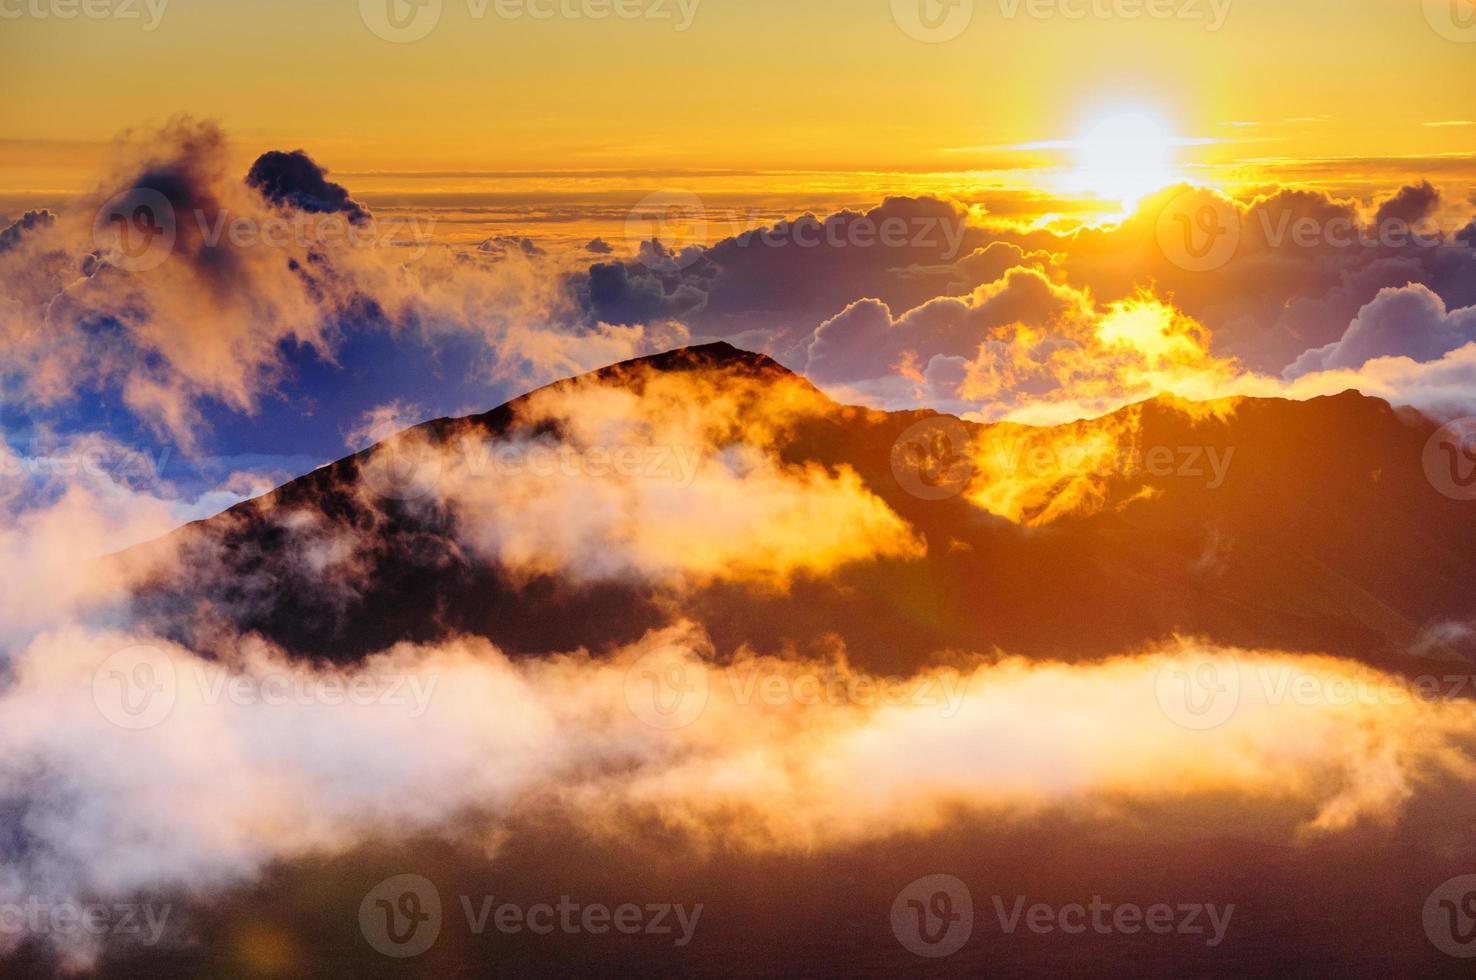 Clouds at sunrise over Haleakala Crater, Maui, Hawaii, USA photo